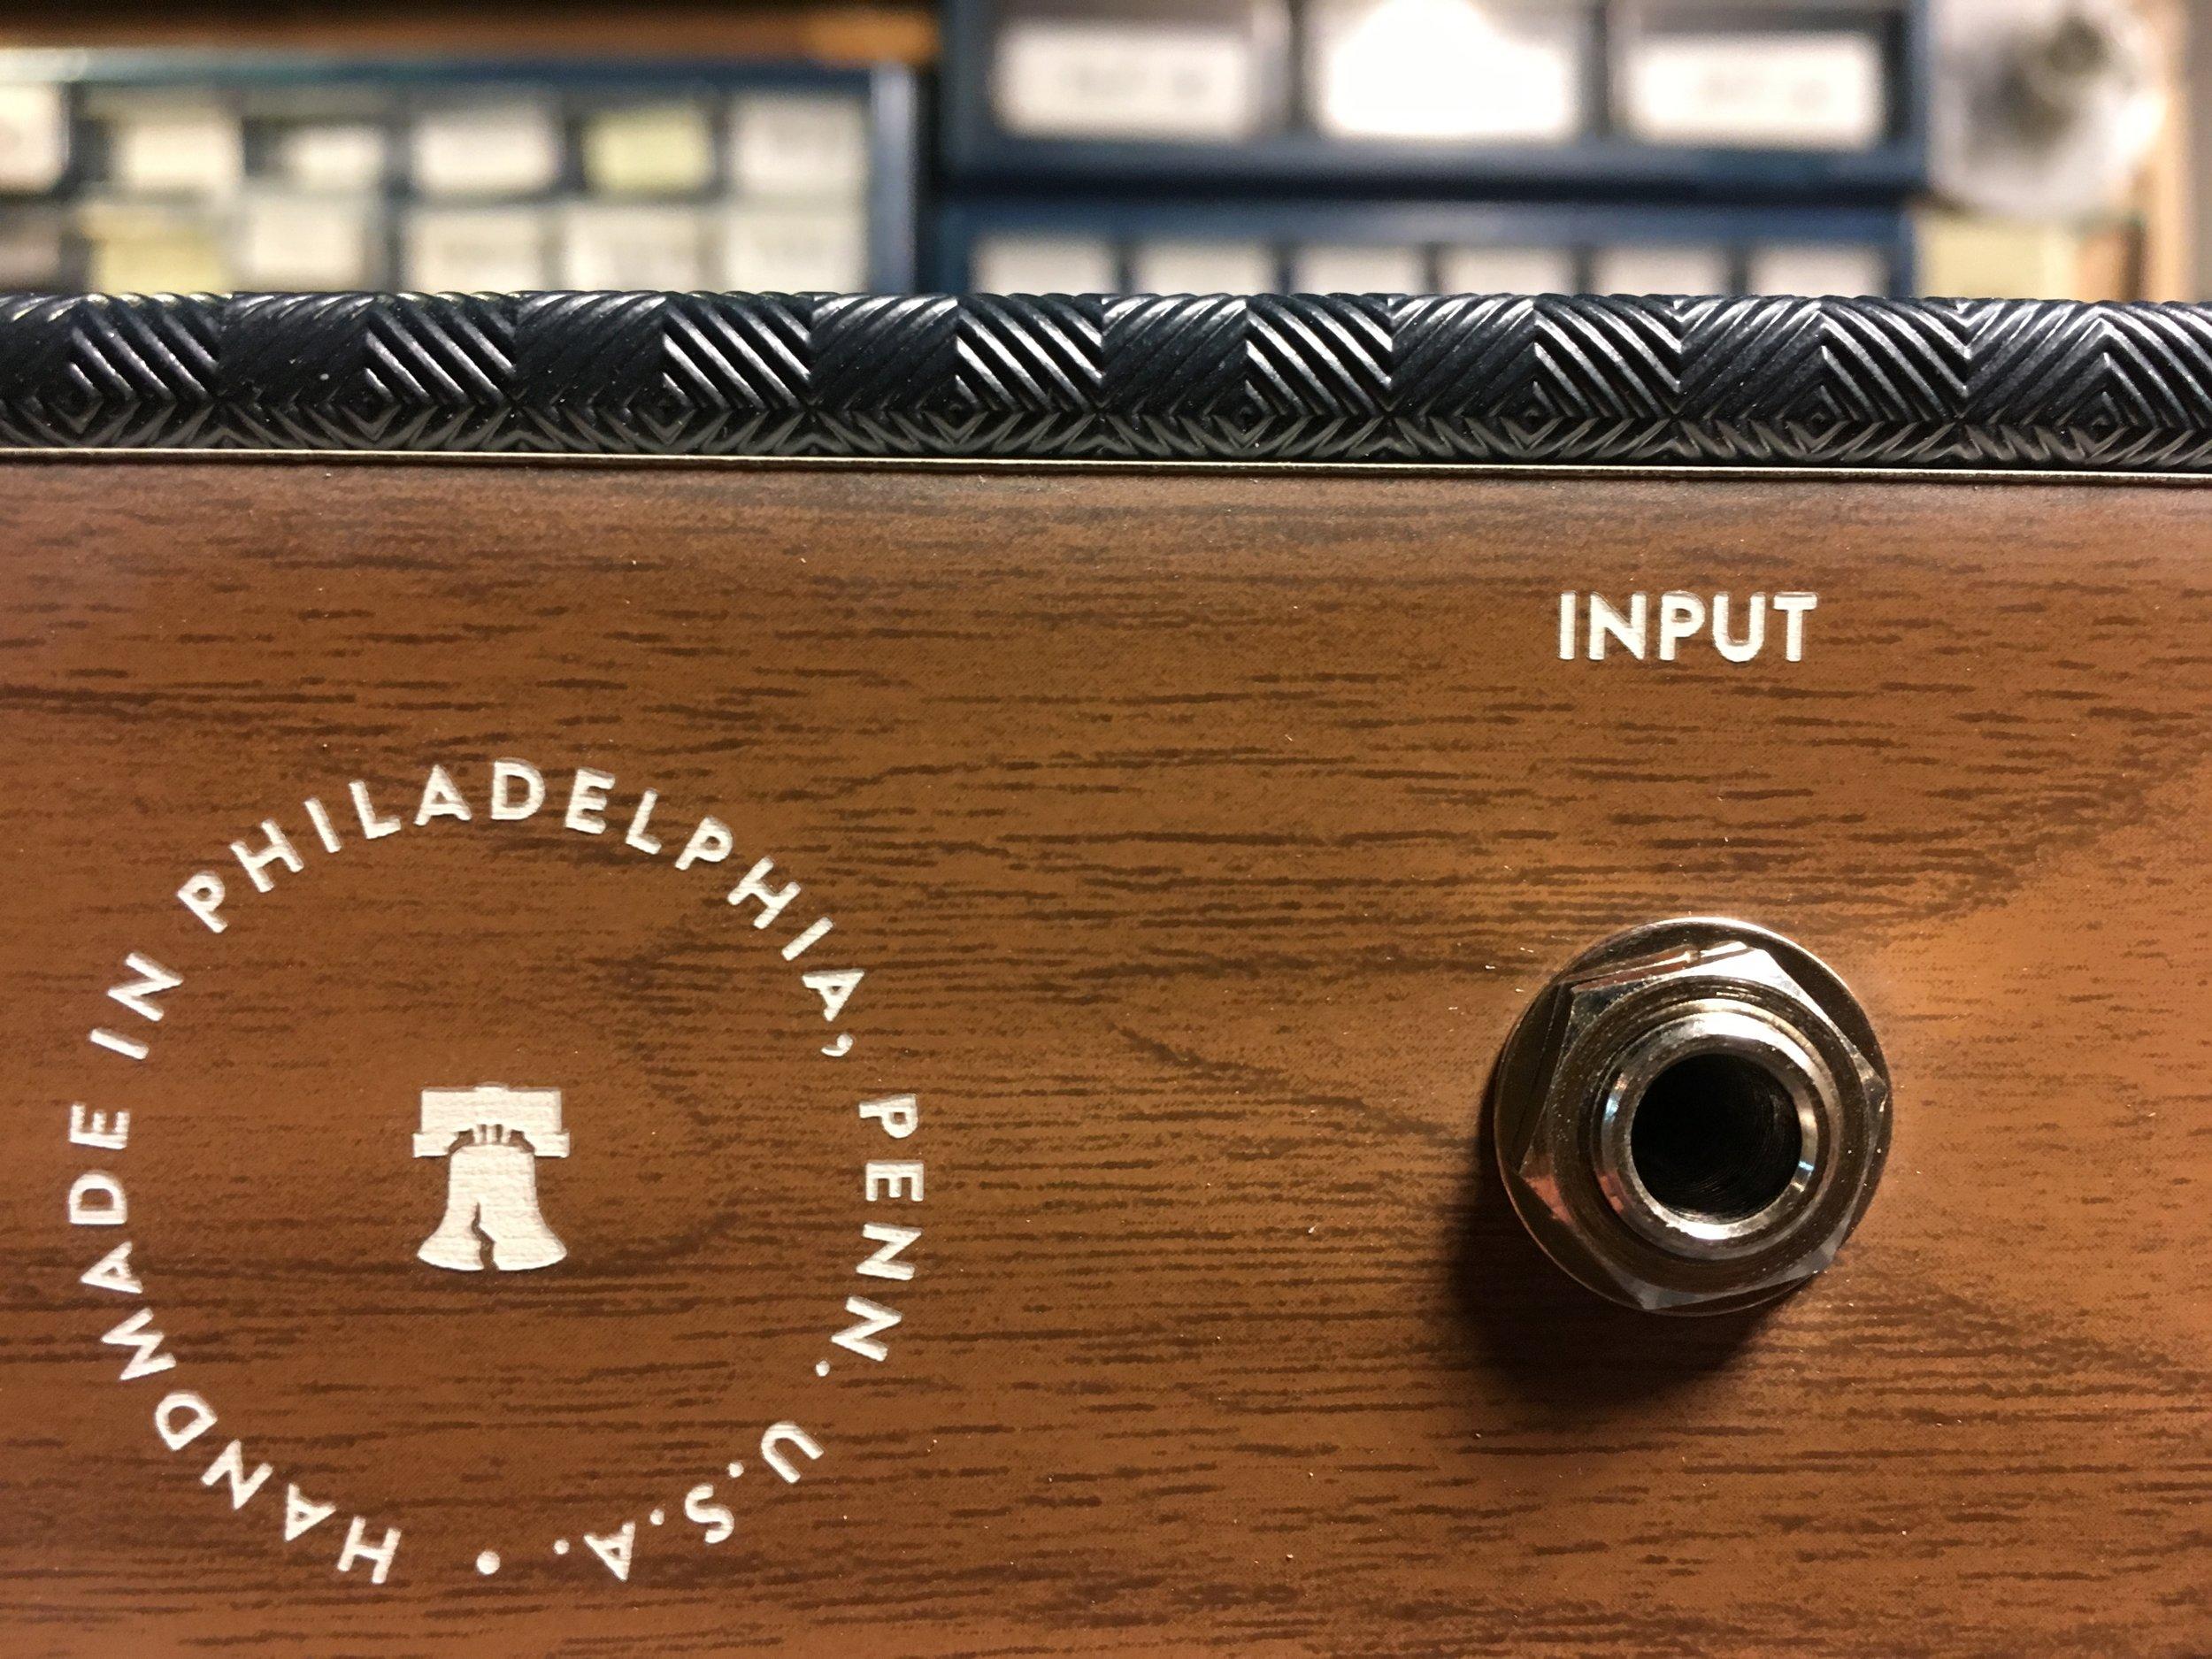 IMG-6371.JPG